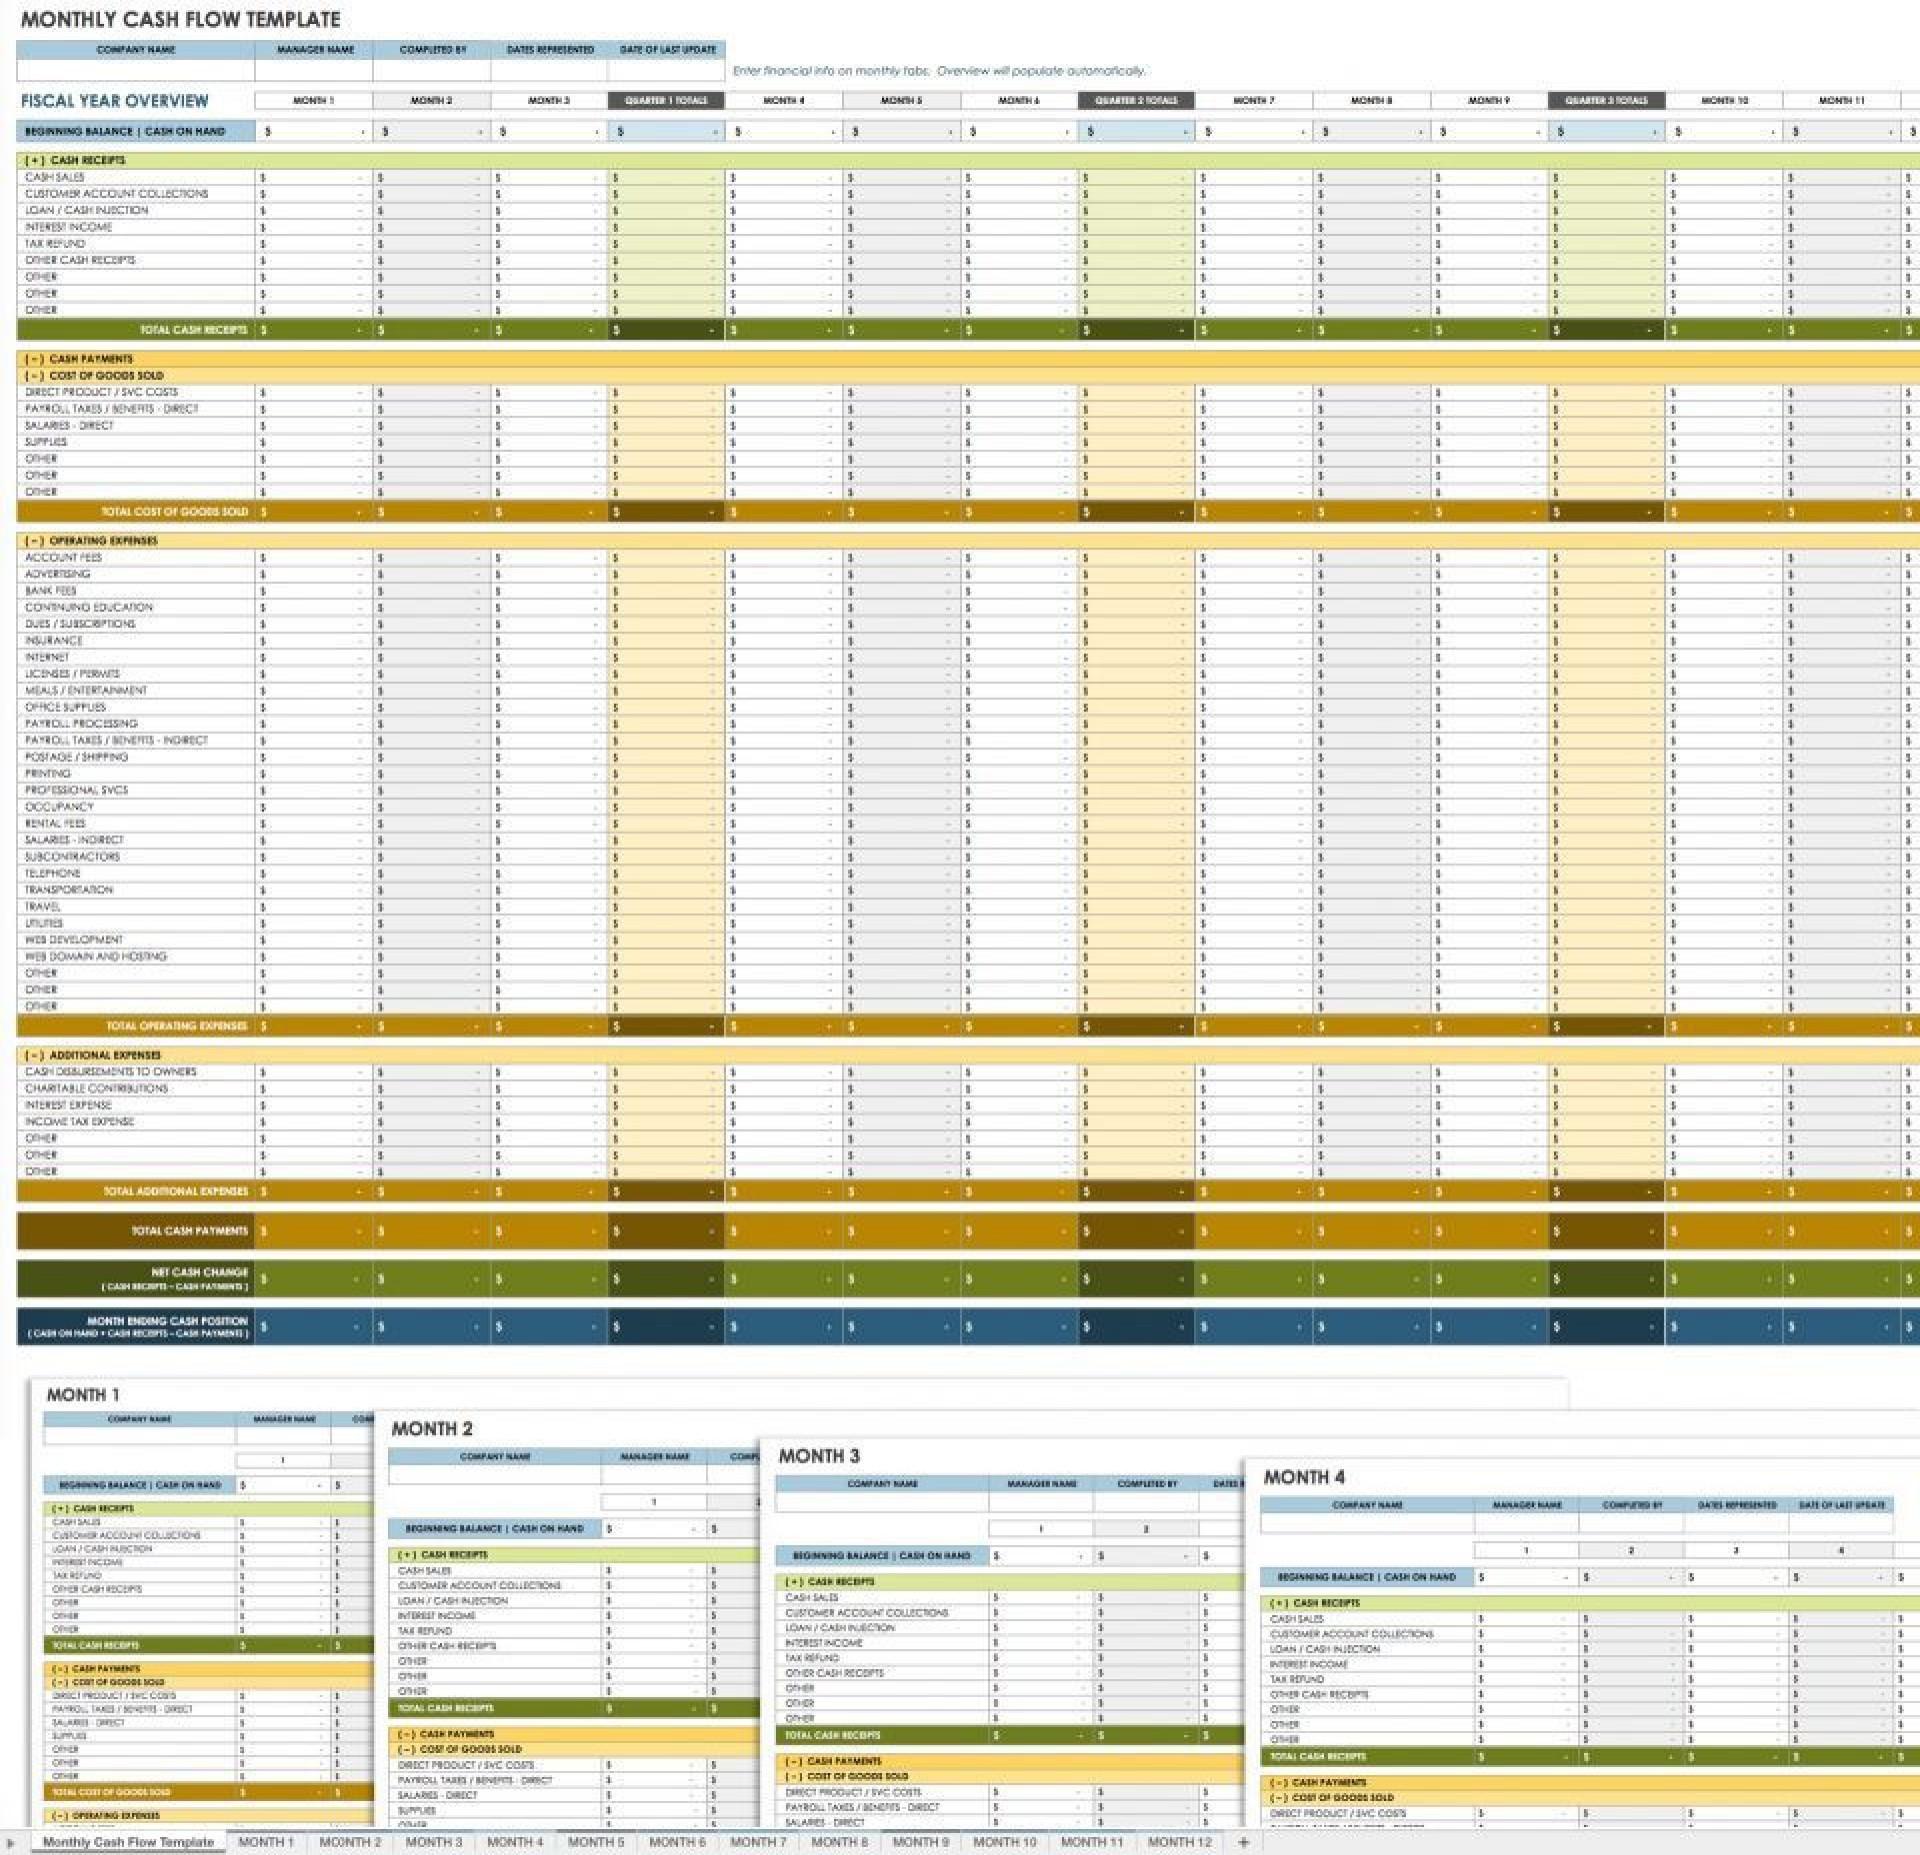 006 Shocking Cash Flow Forecast Excel Template Uk Free High Resolution 1920